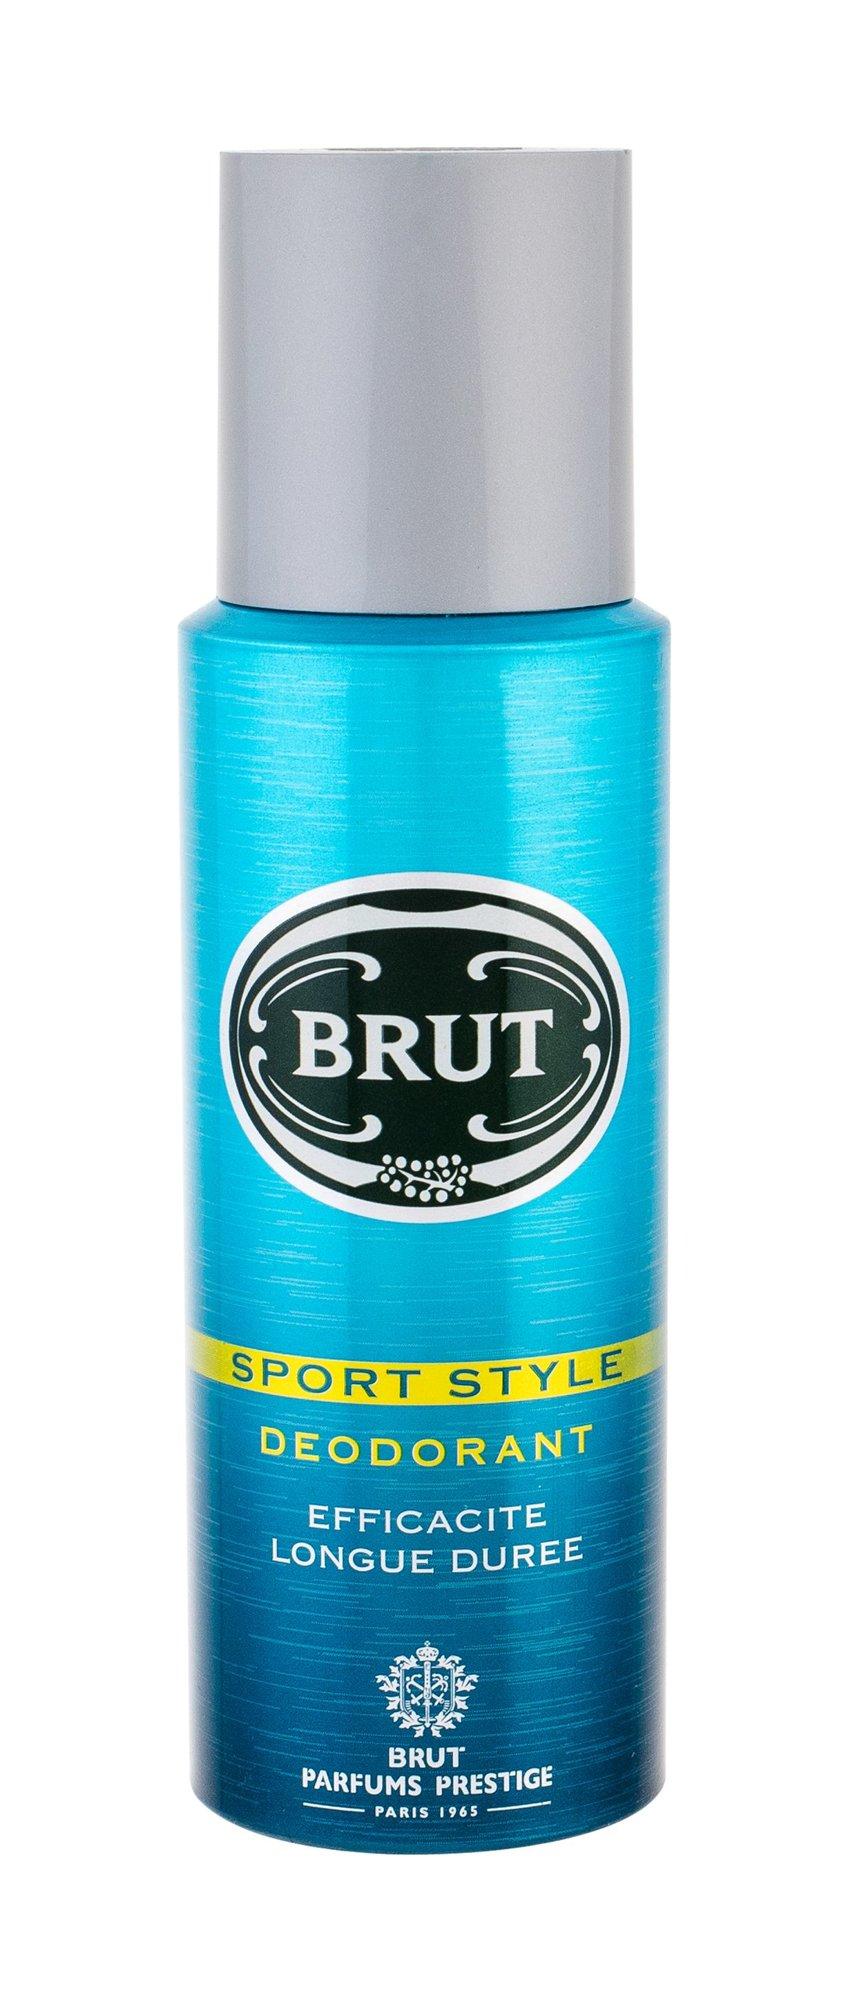 Brut Sport Style